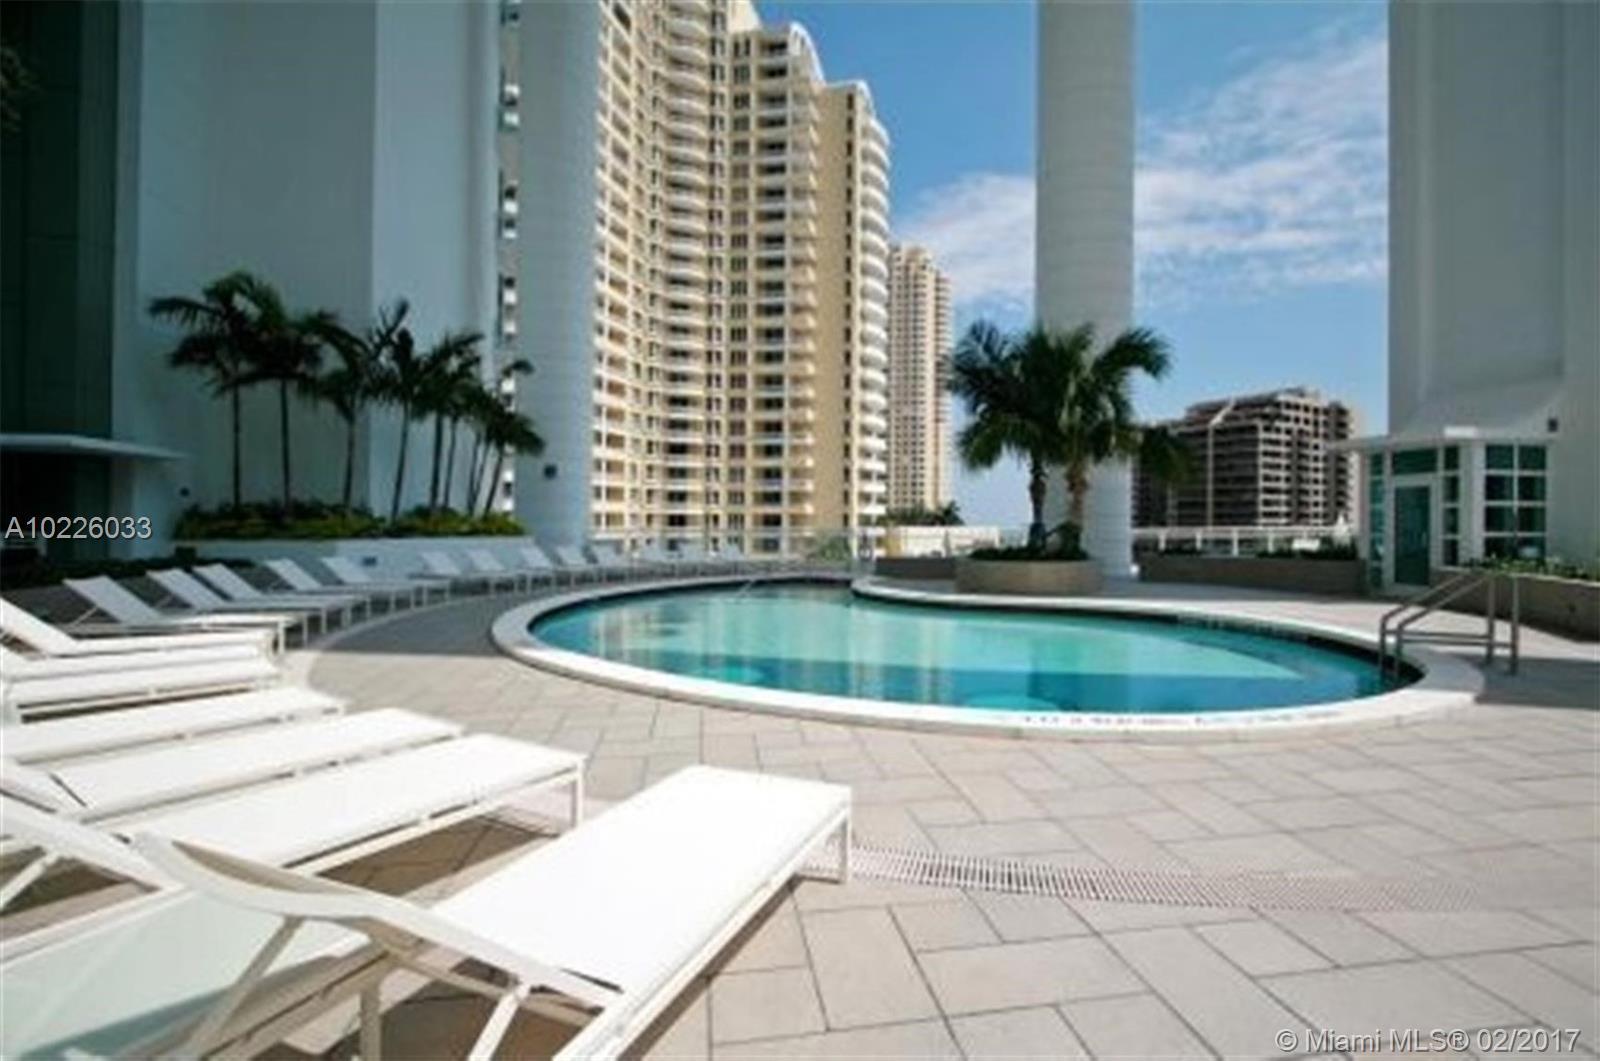 900 Brickell Key Blvd #2205, Miami FL, 33131